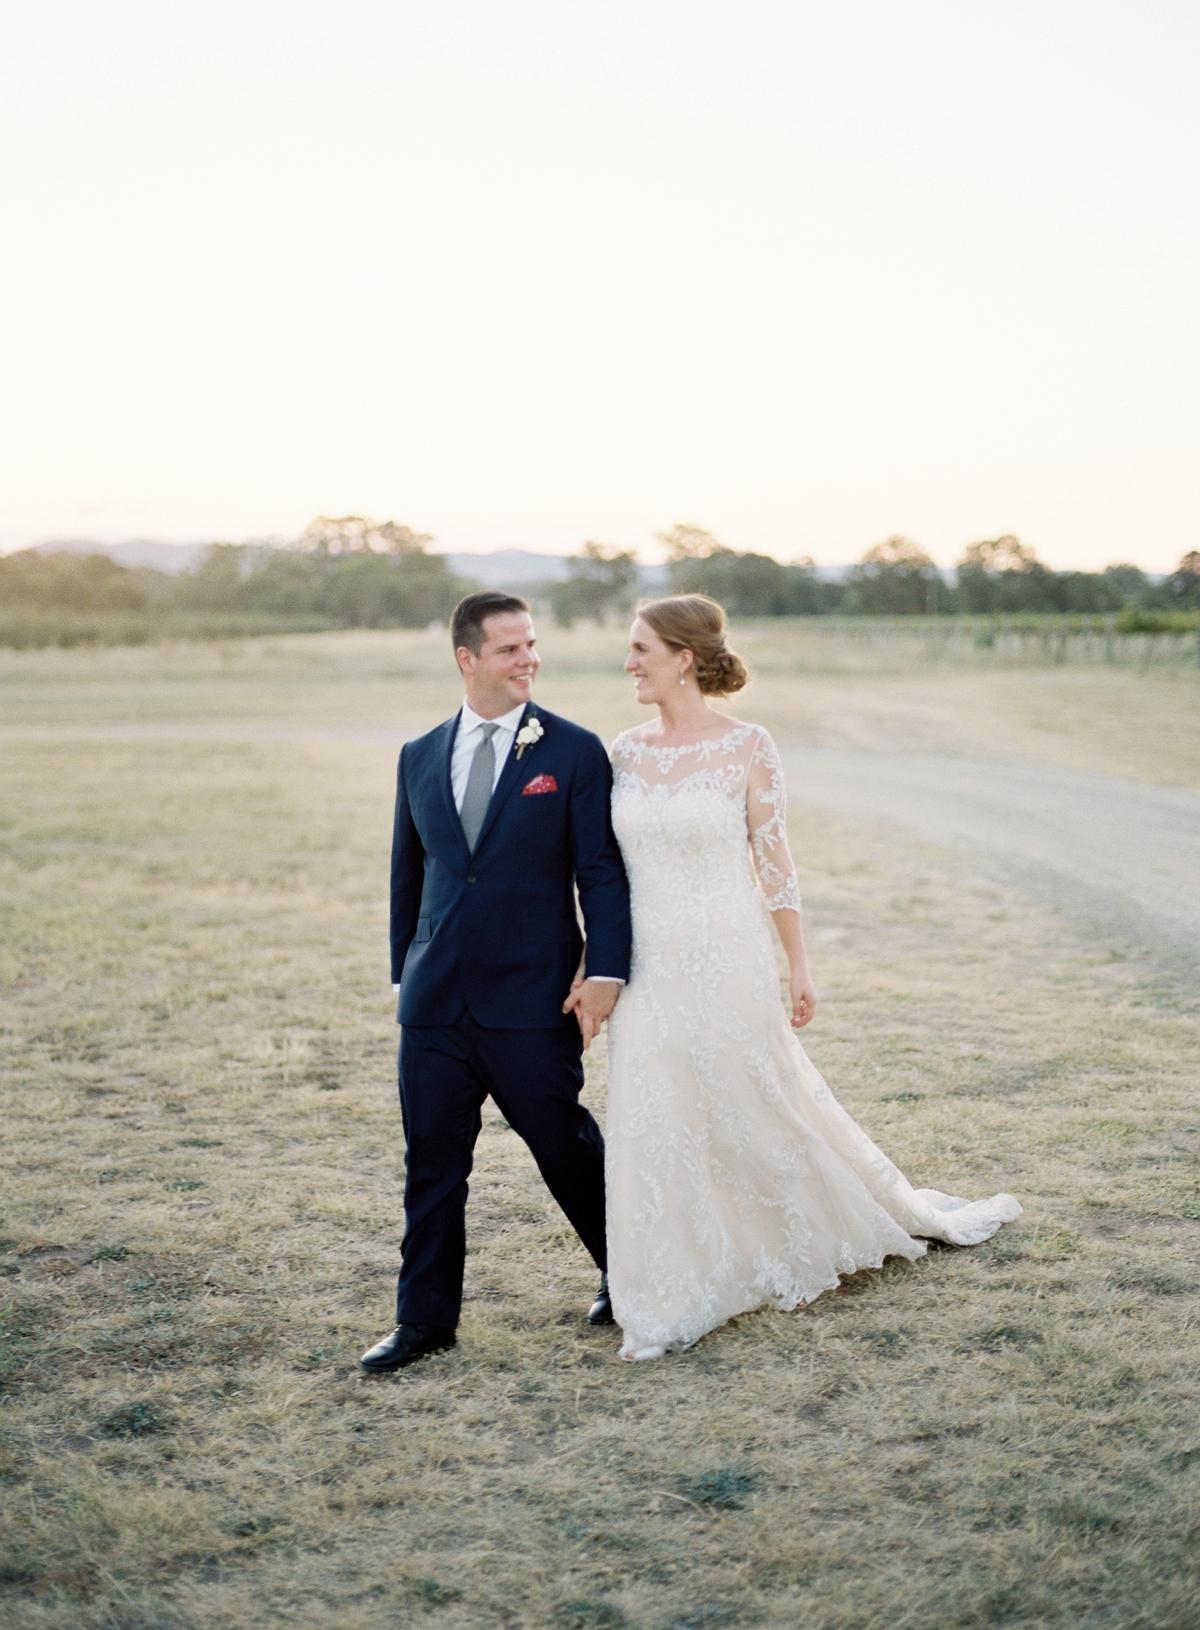 The Vine Grove Mudgee Wedding, Photography by Mr Edwards_1812.jpg